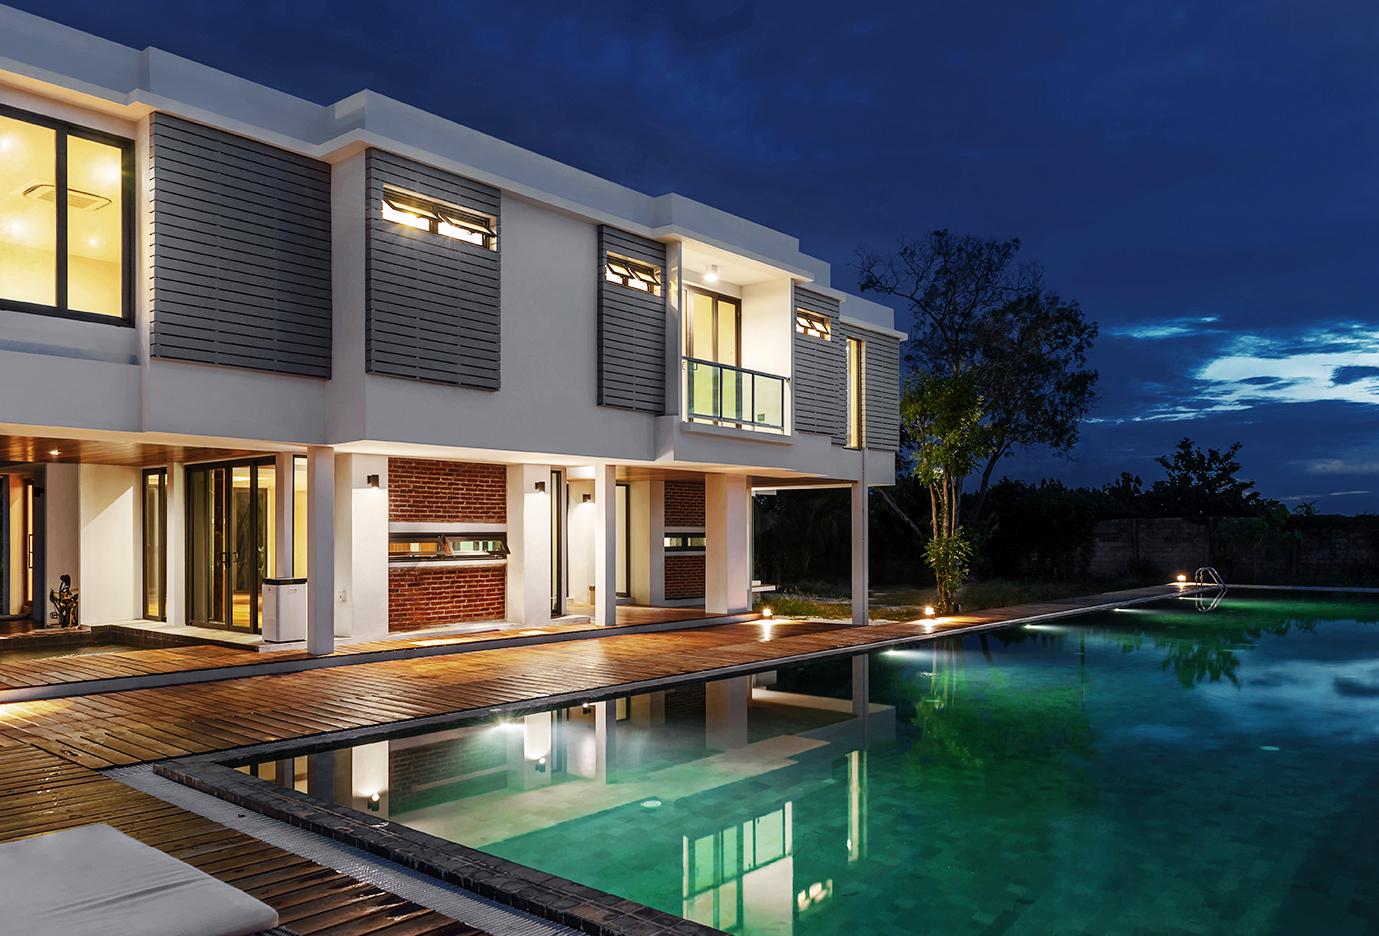 10design uthai residence house design modern architecture pattani thailand swimming pool 01